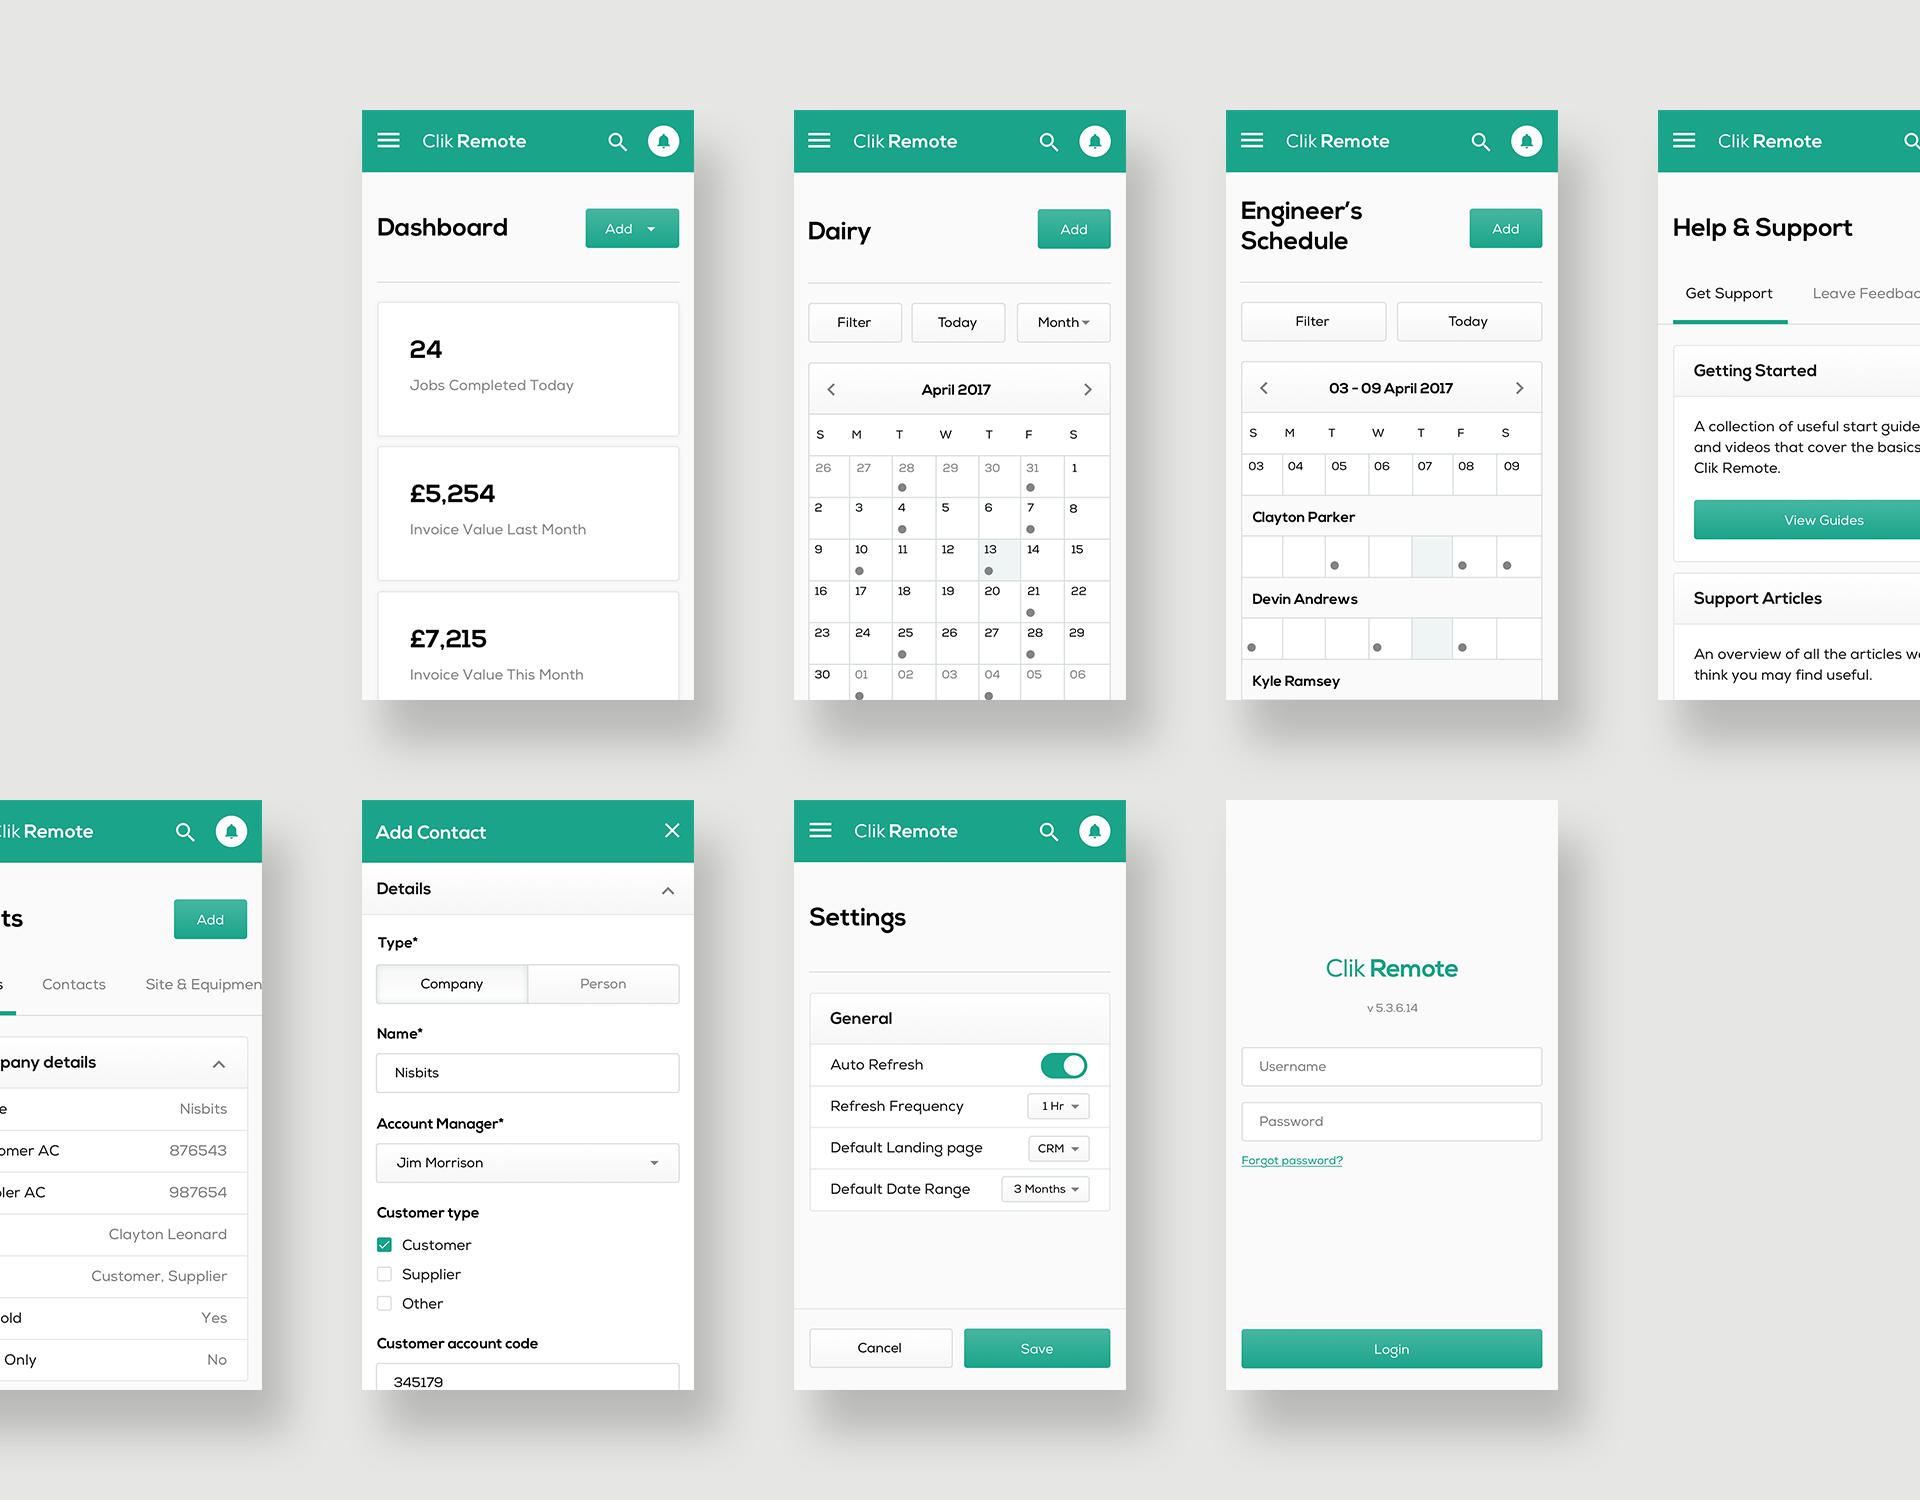 Clik Remote Mobile App User Interface (UI) Design